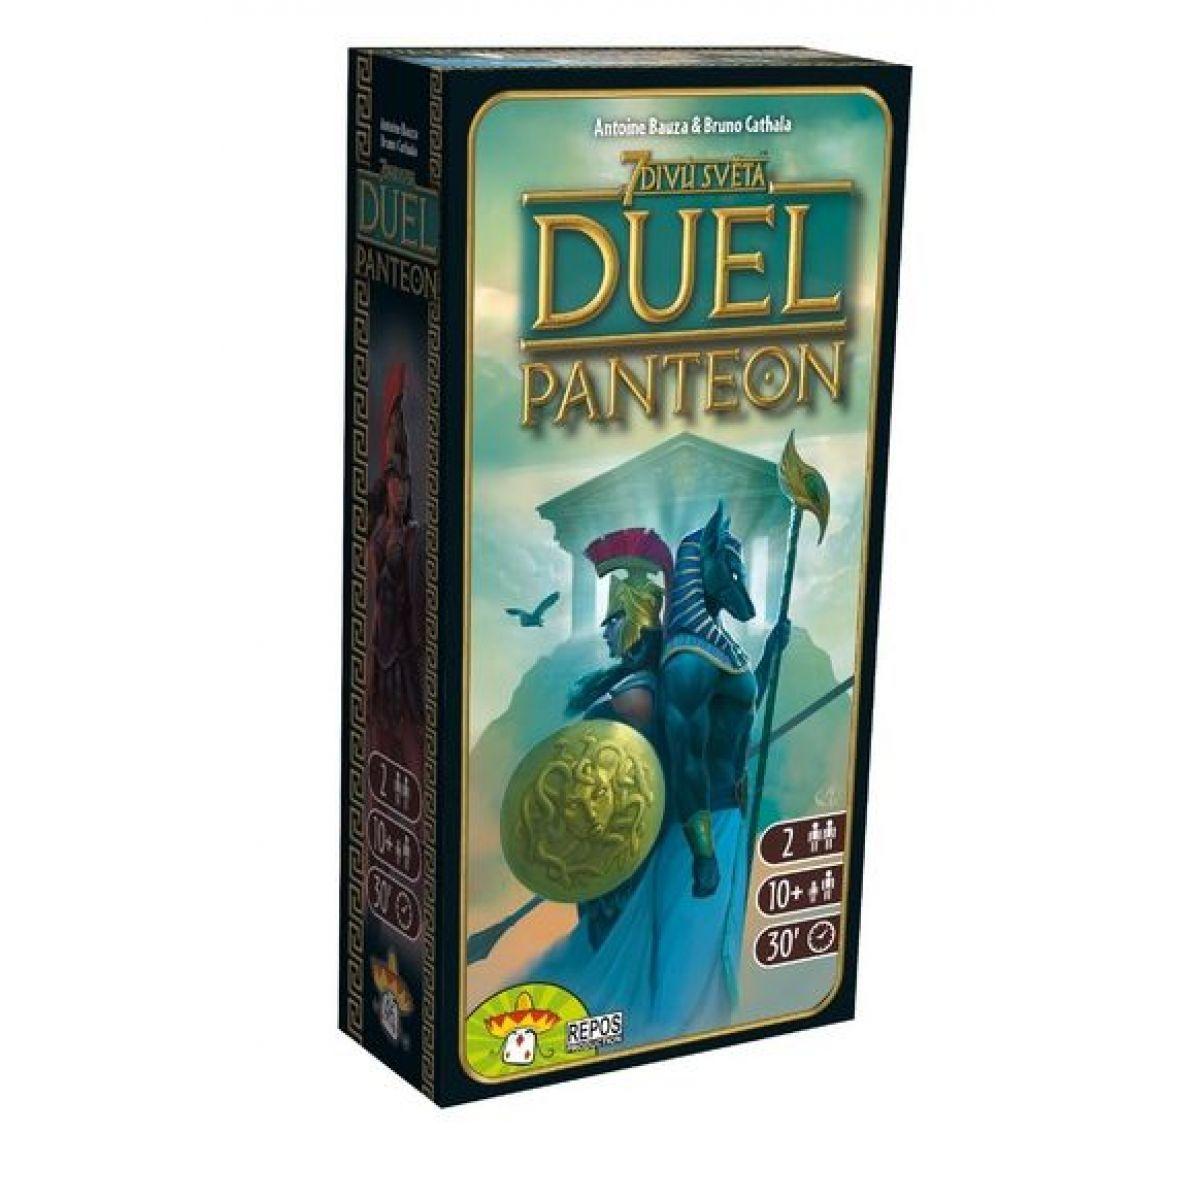 Black Fire 7 Divov sveta Duel Pantheon